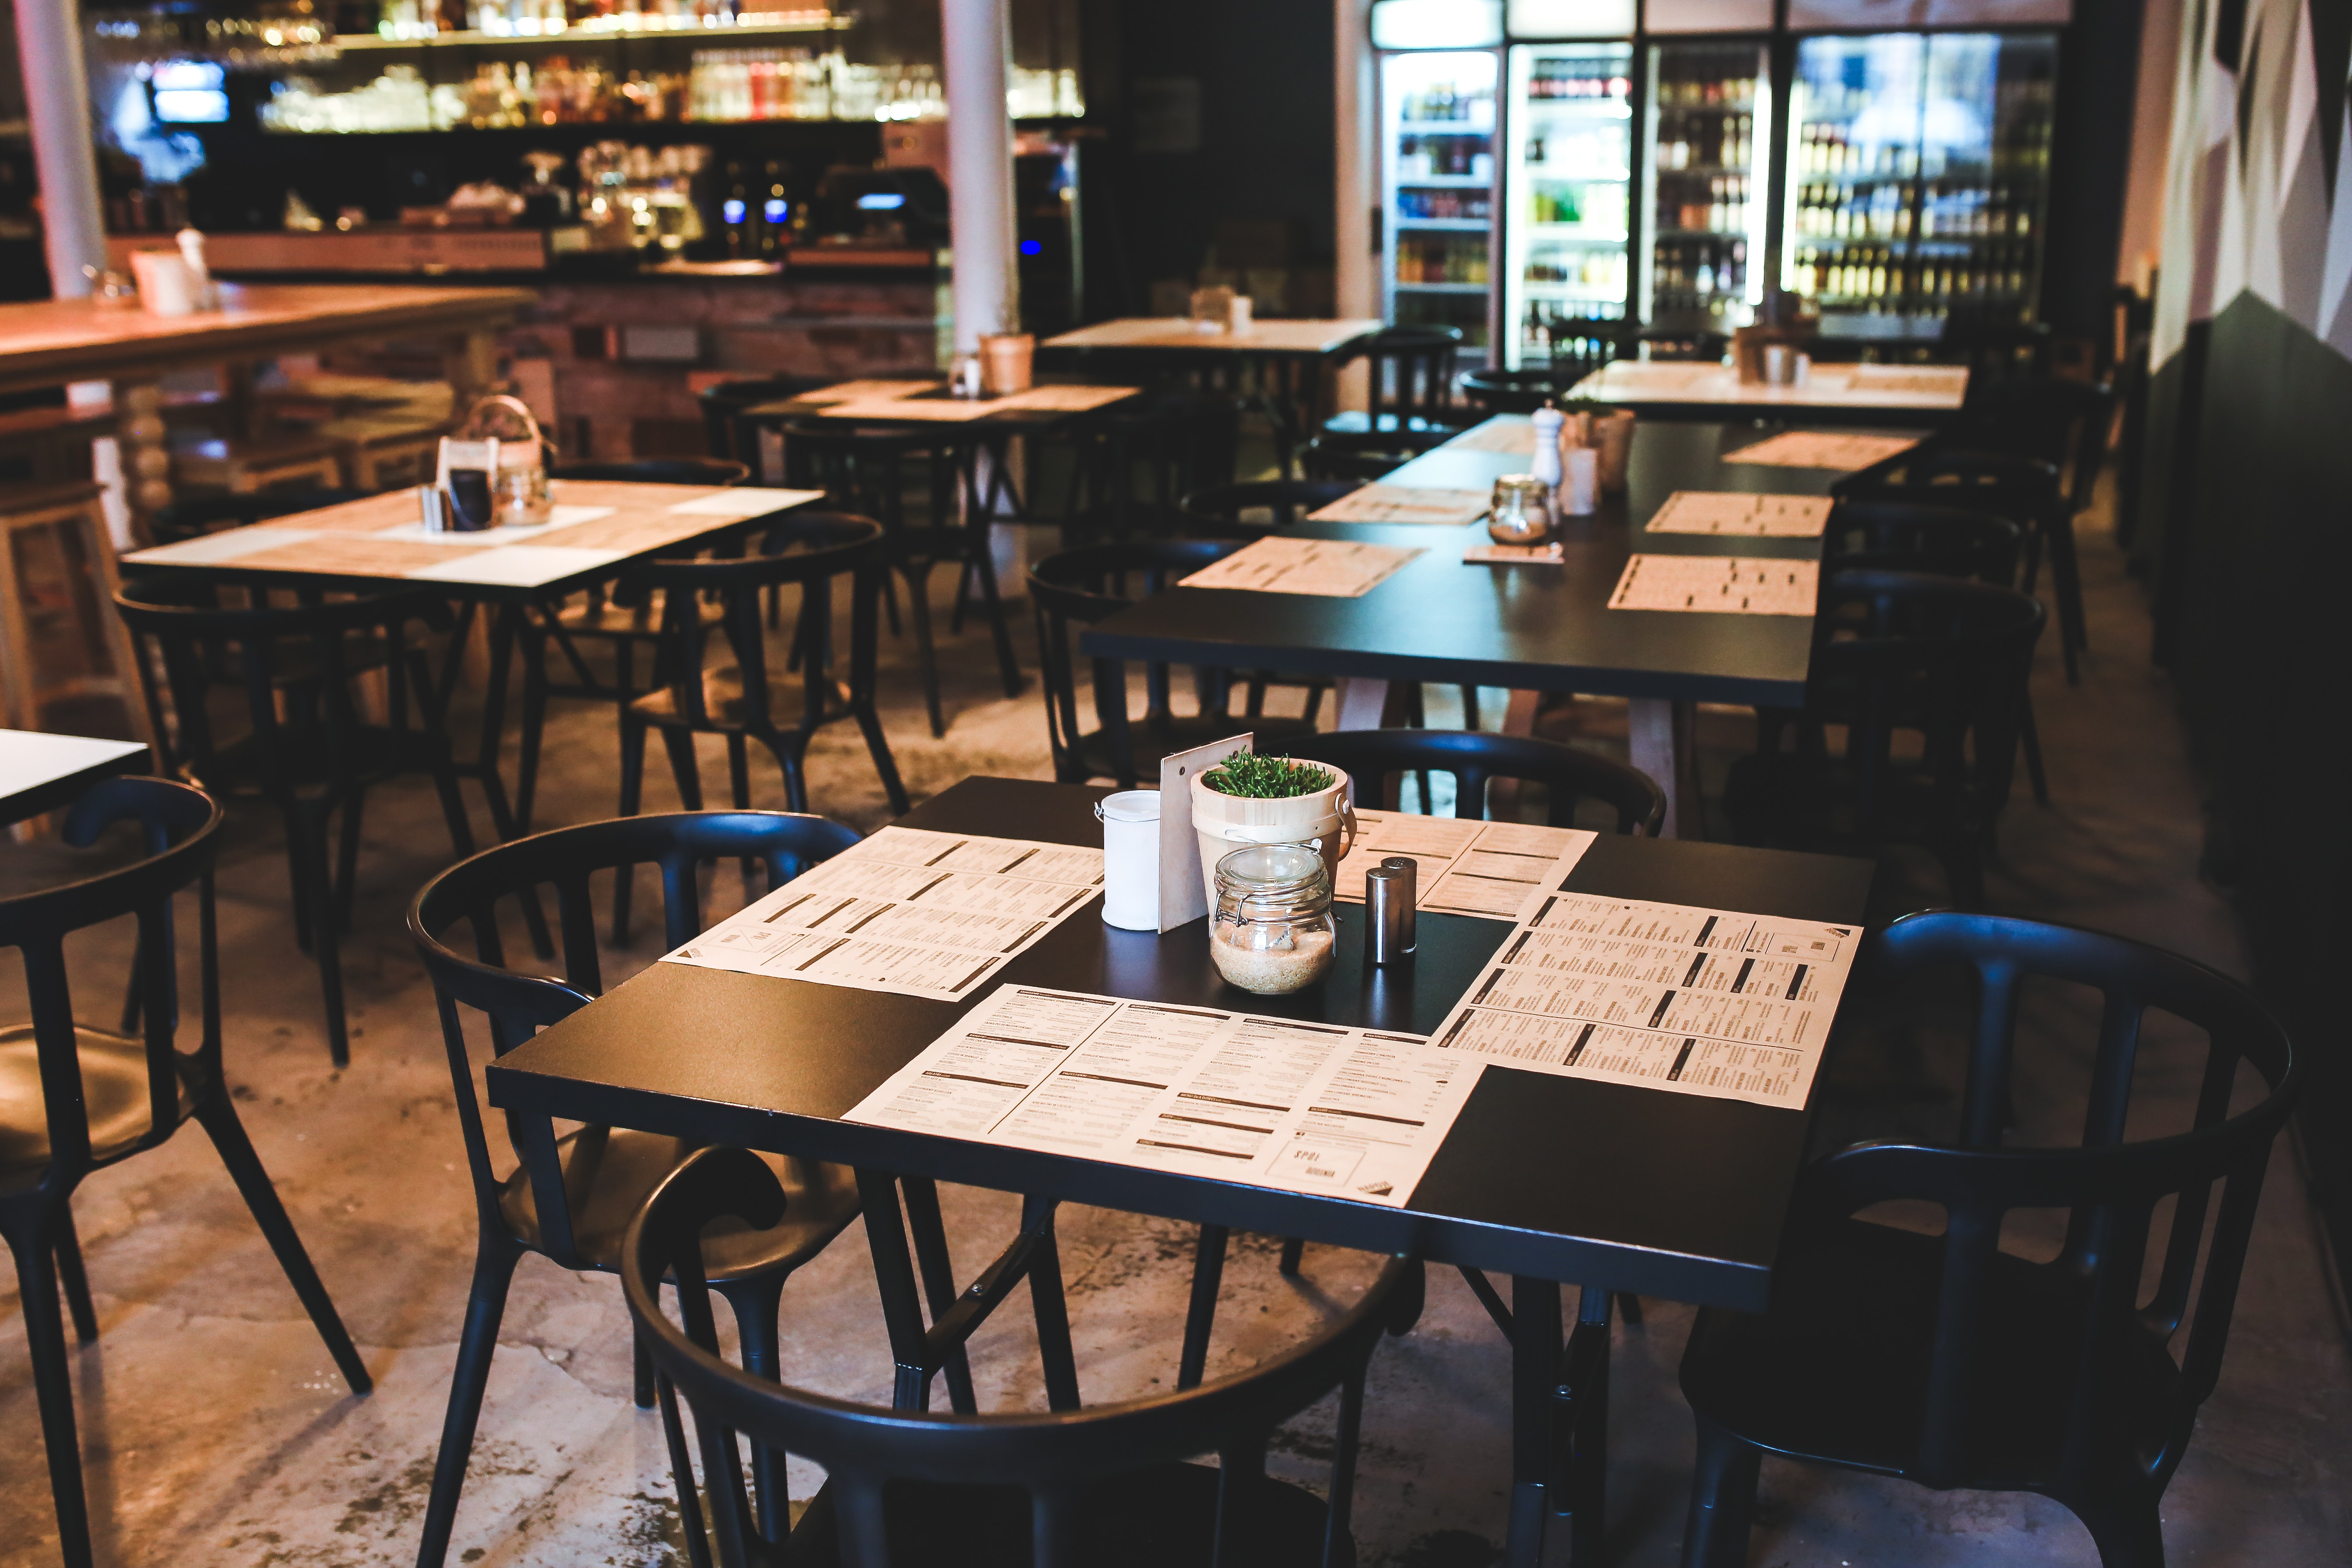 Restaurant Cafe Food Hospitality